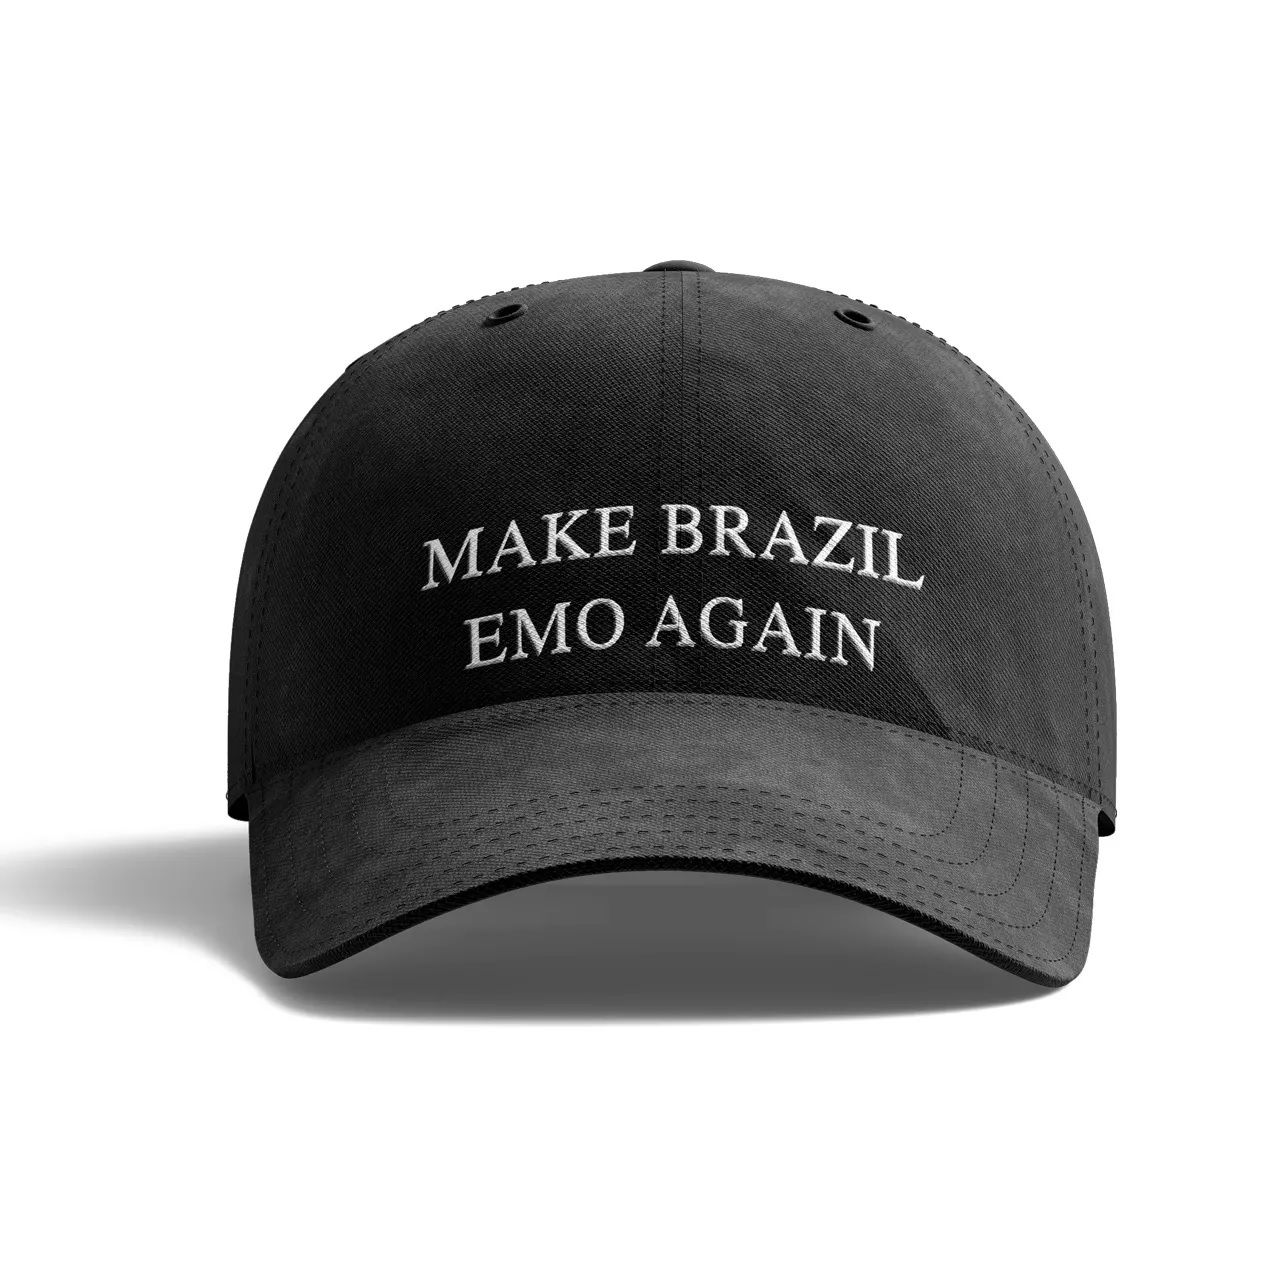 The Maine - Make Brazil Emo Again [Boné]